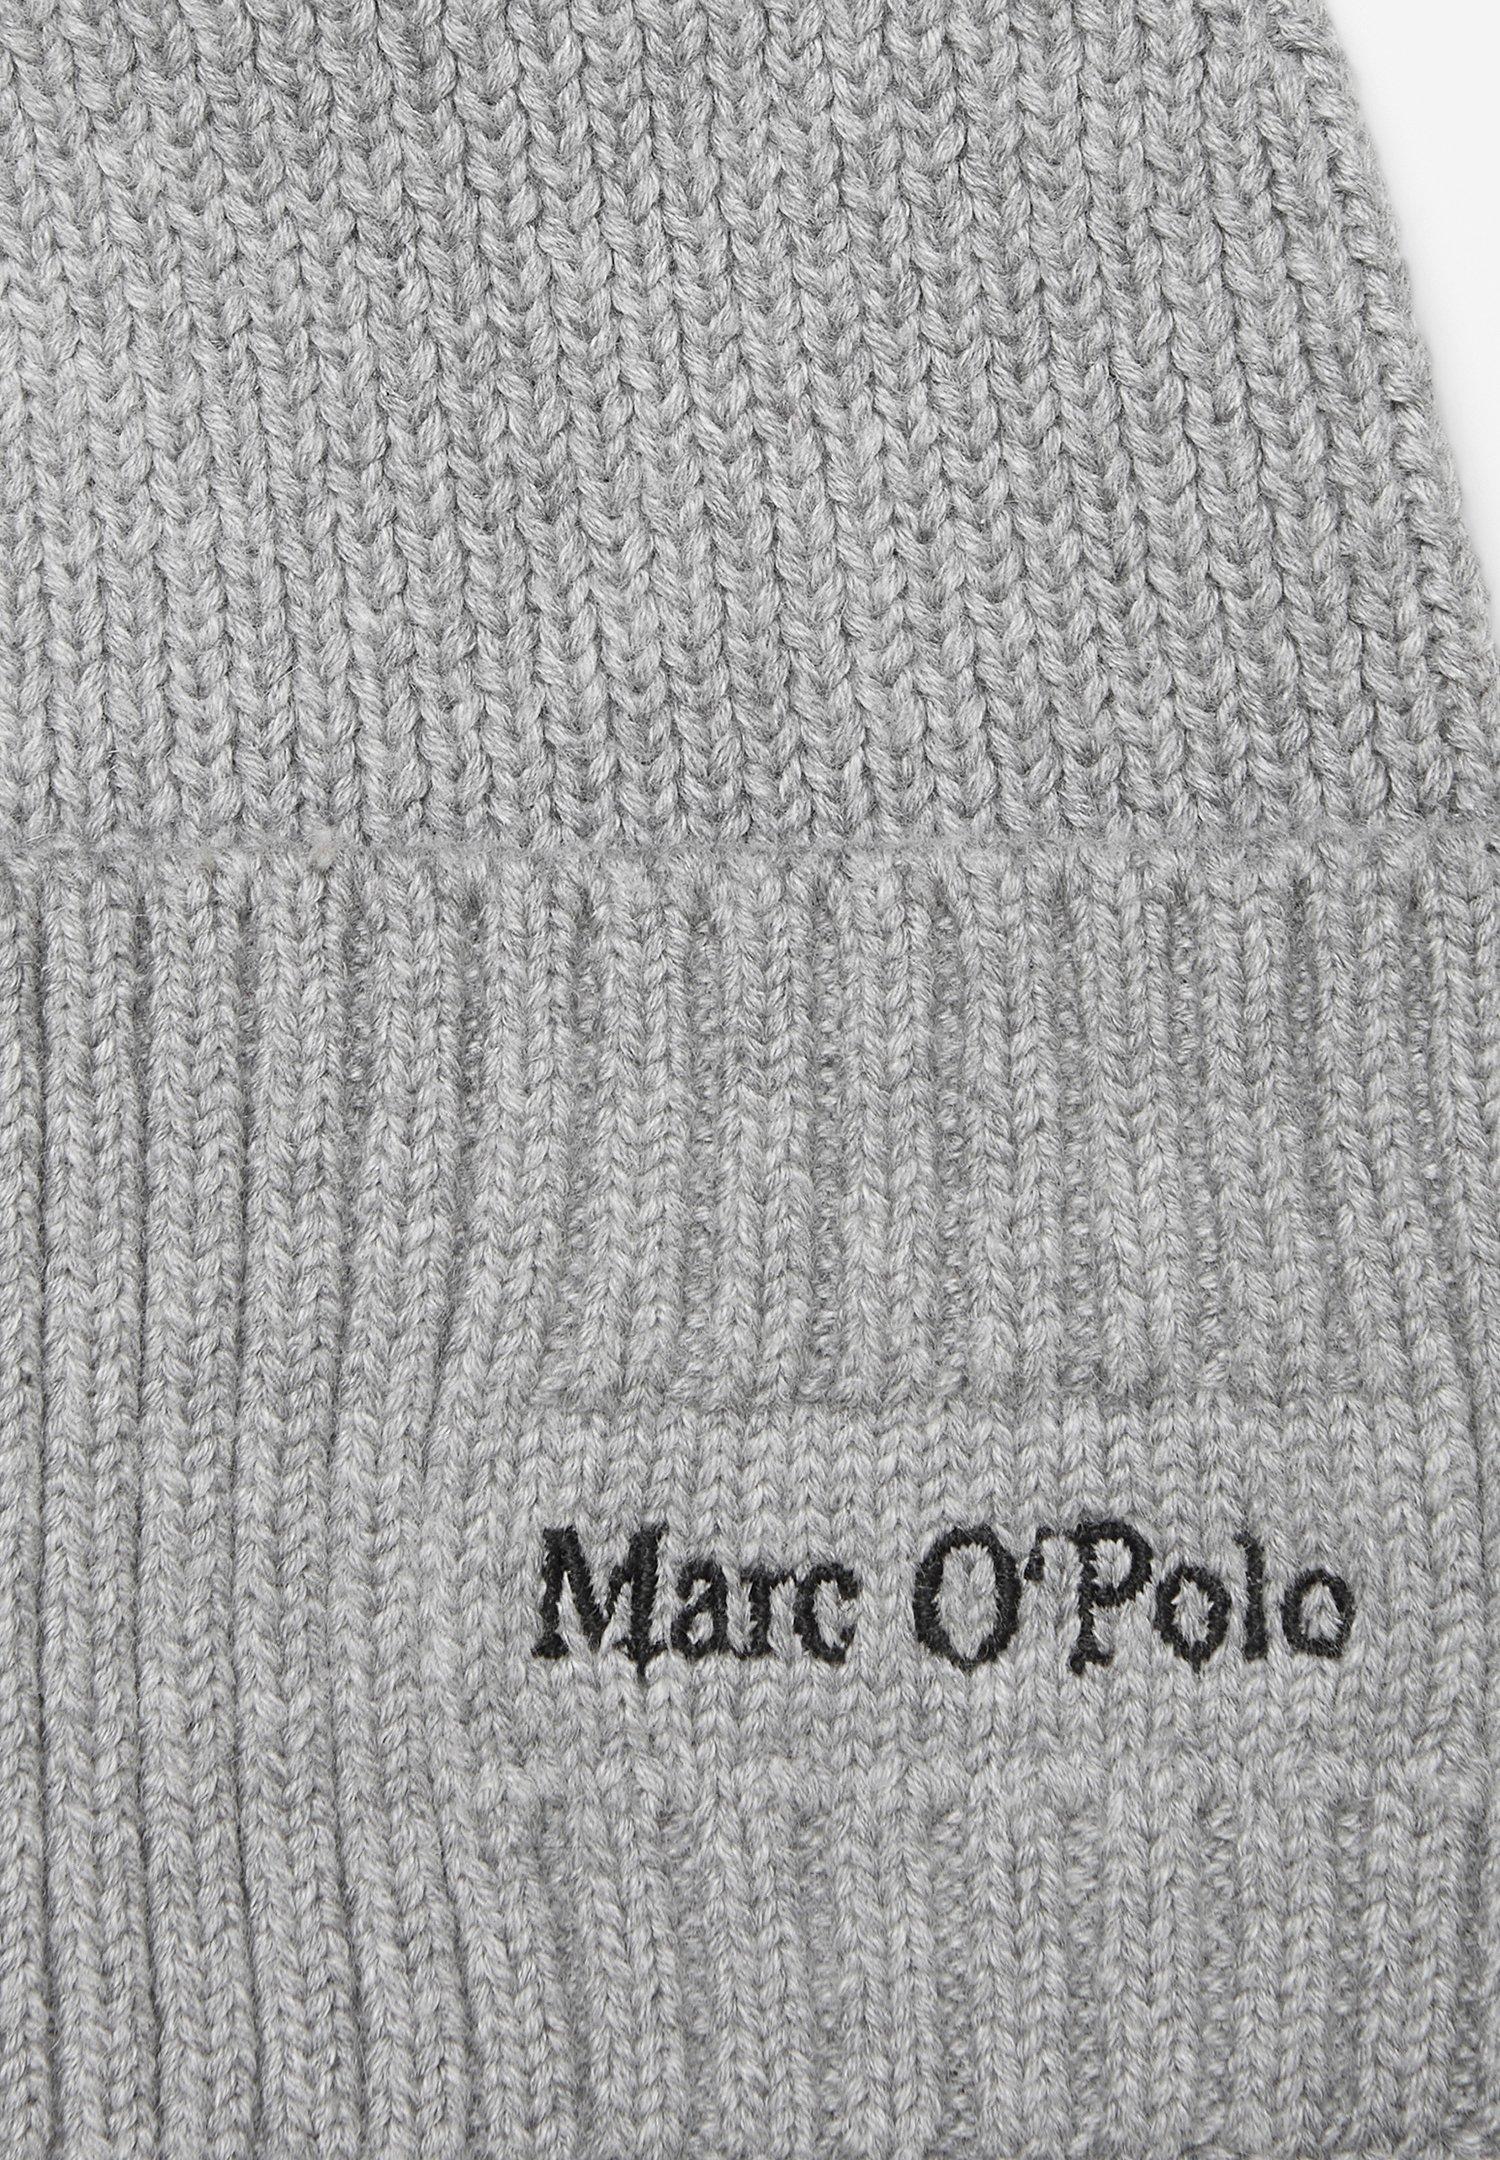 Marc O'polo Strick-mütze Mit Kaschmir-anteil - Mütze Grey Melange/grau